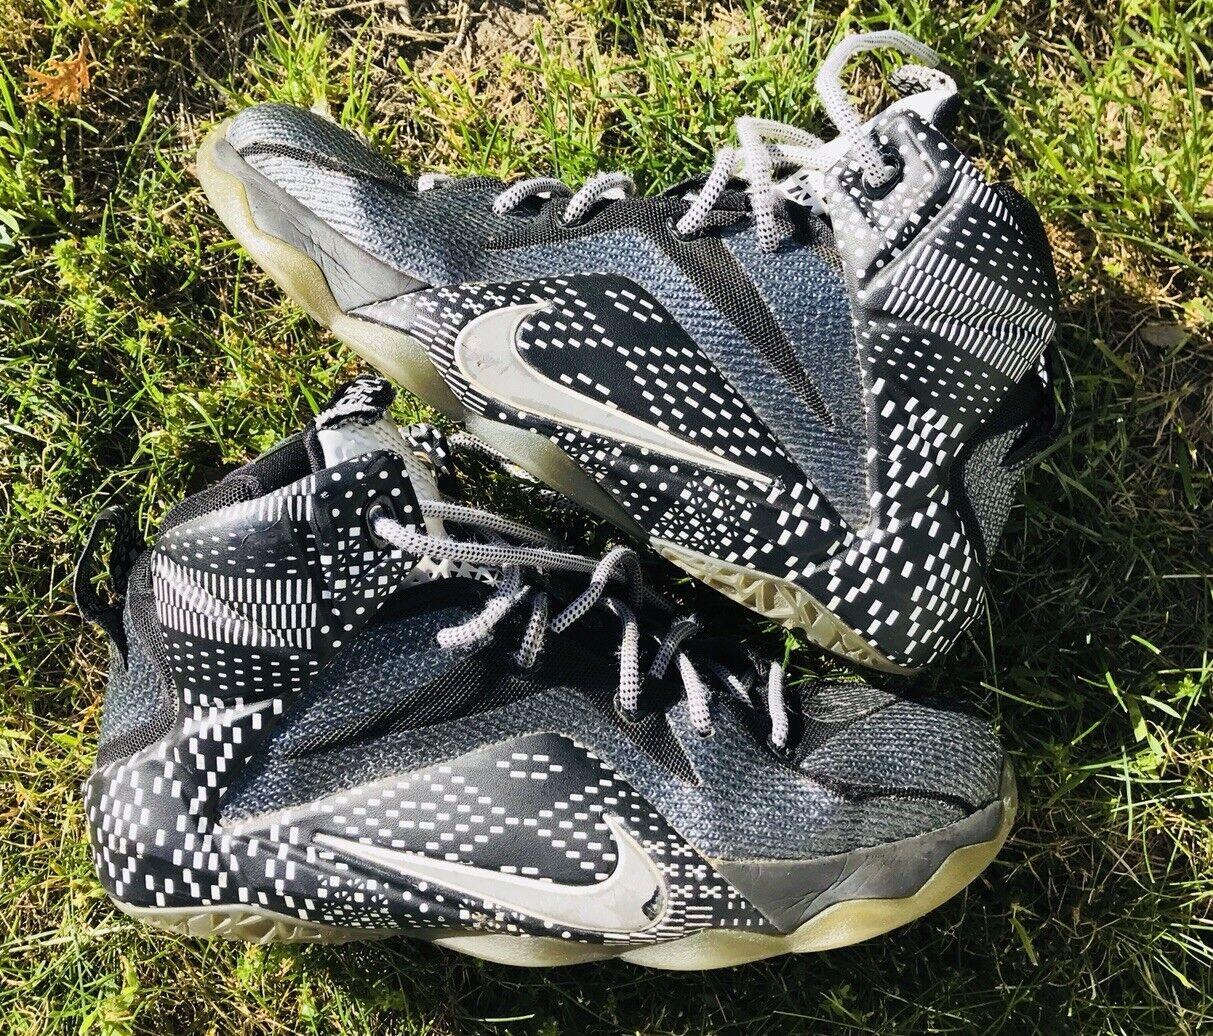 Nike lunar skyelux Uomo correndo formatori 855808 scarpe, scarpe scarpe scarpe 001 241458